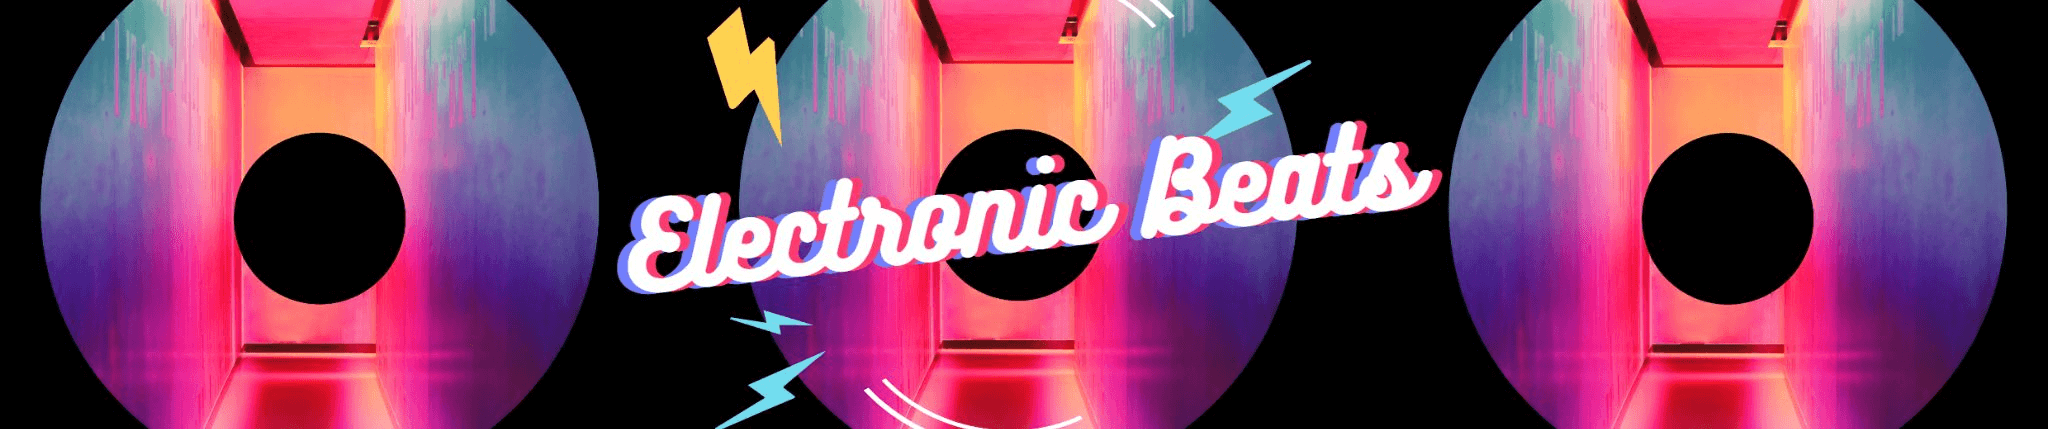 Fotor electronic beats SoundCloud banner template